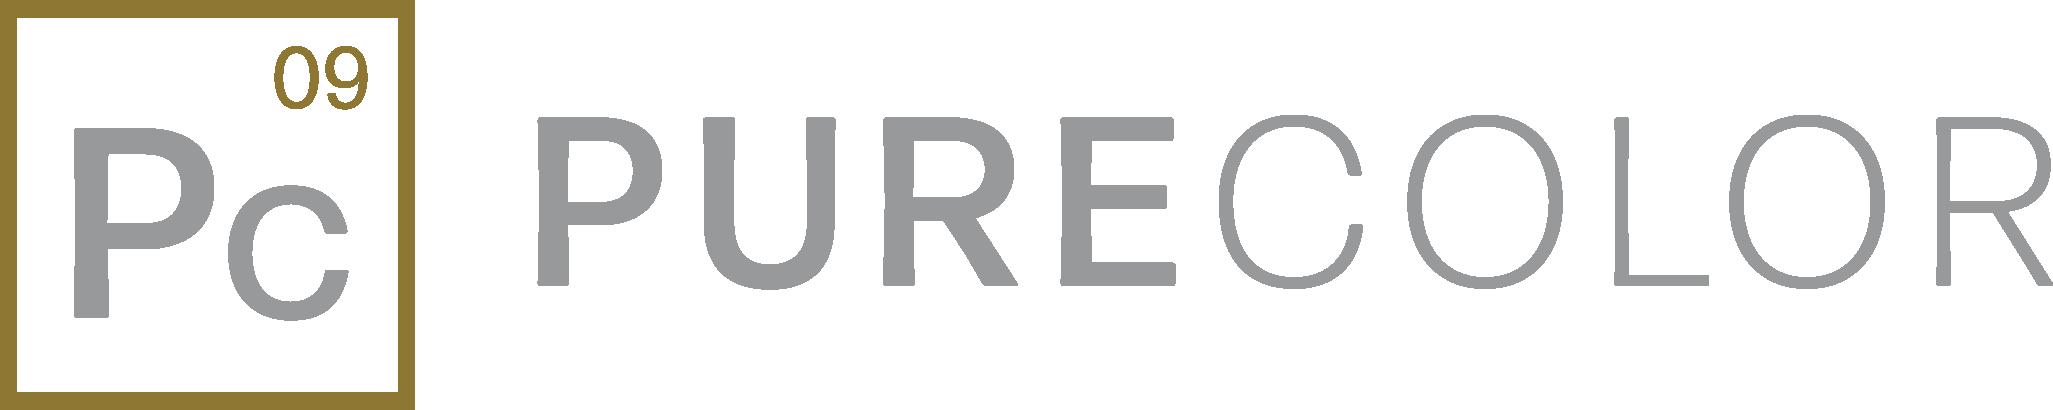 PureColor Logo 2020